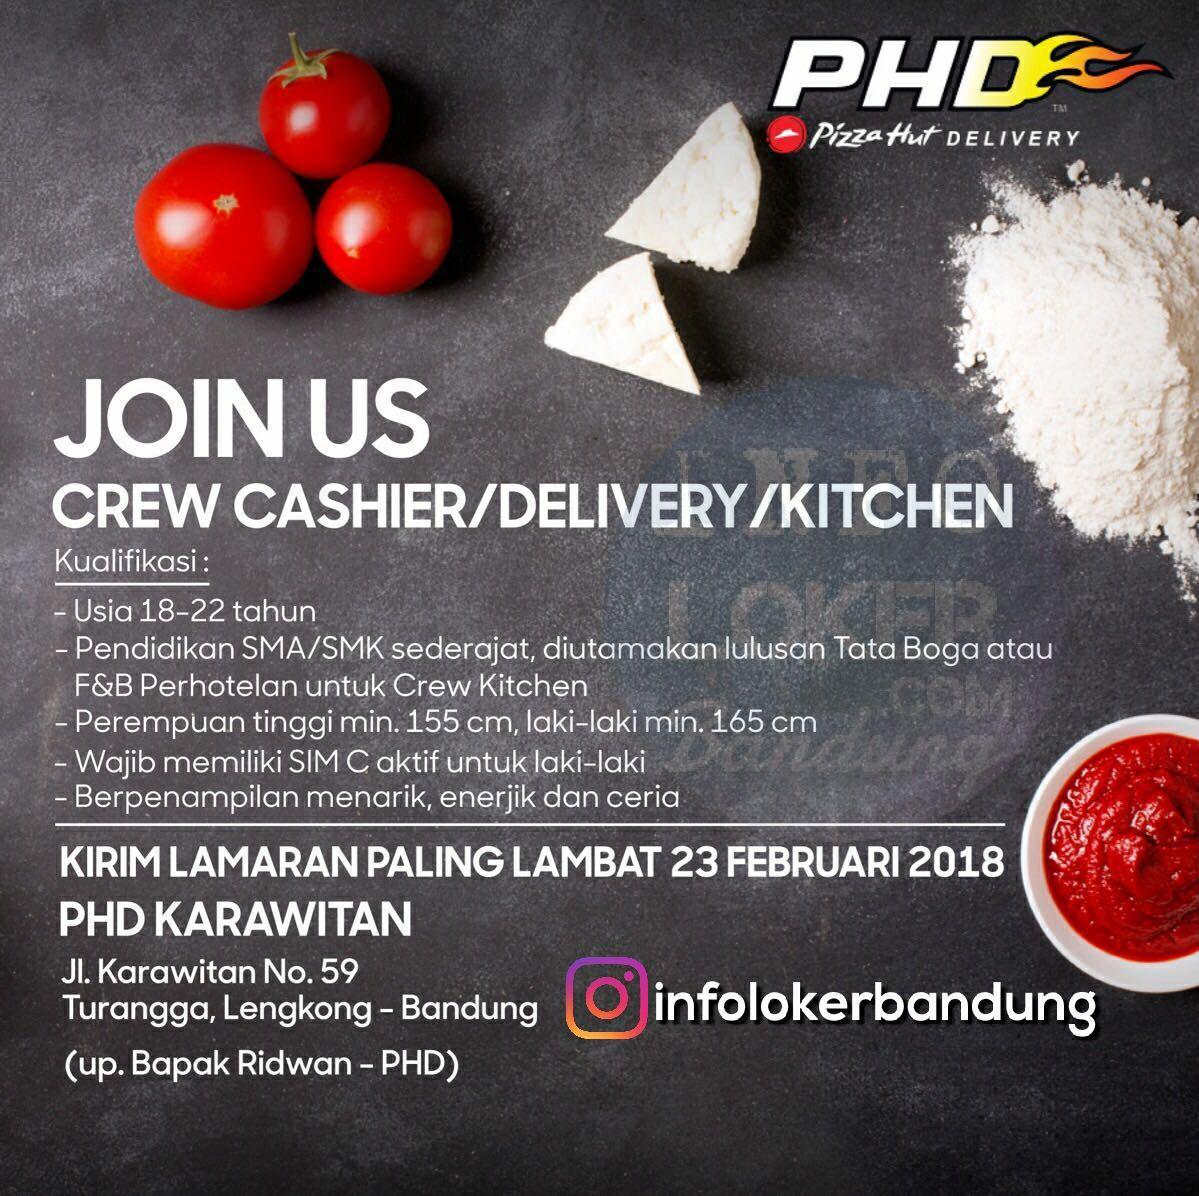 Lowongan Kerja Pizza Hut Delivery ( PHD) Karawitan Bandung Februari 2018